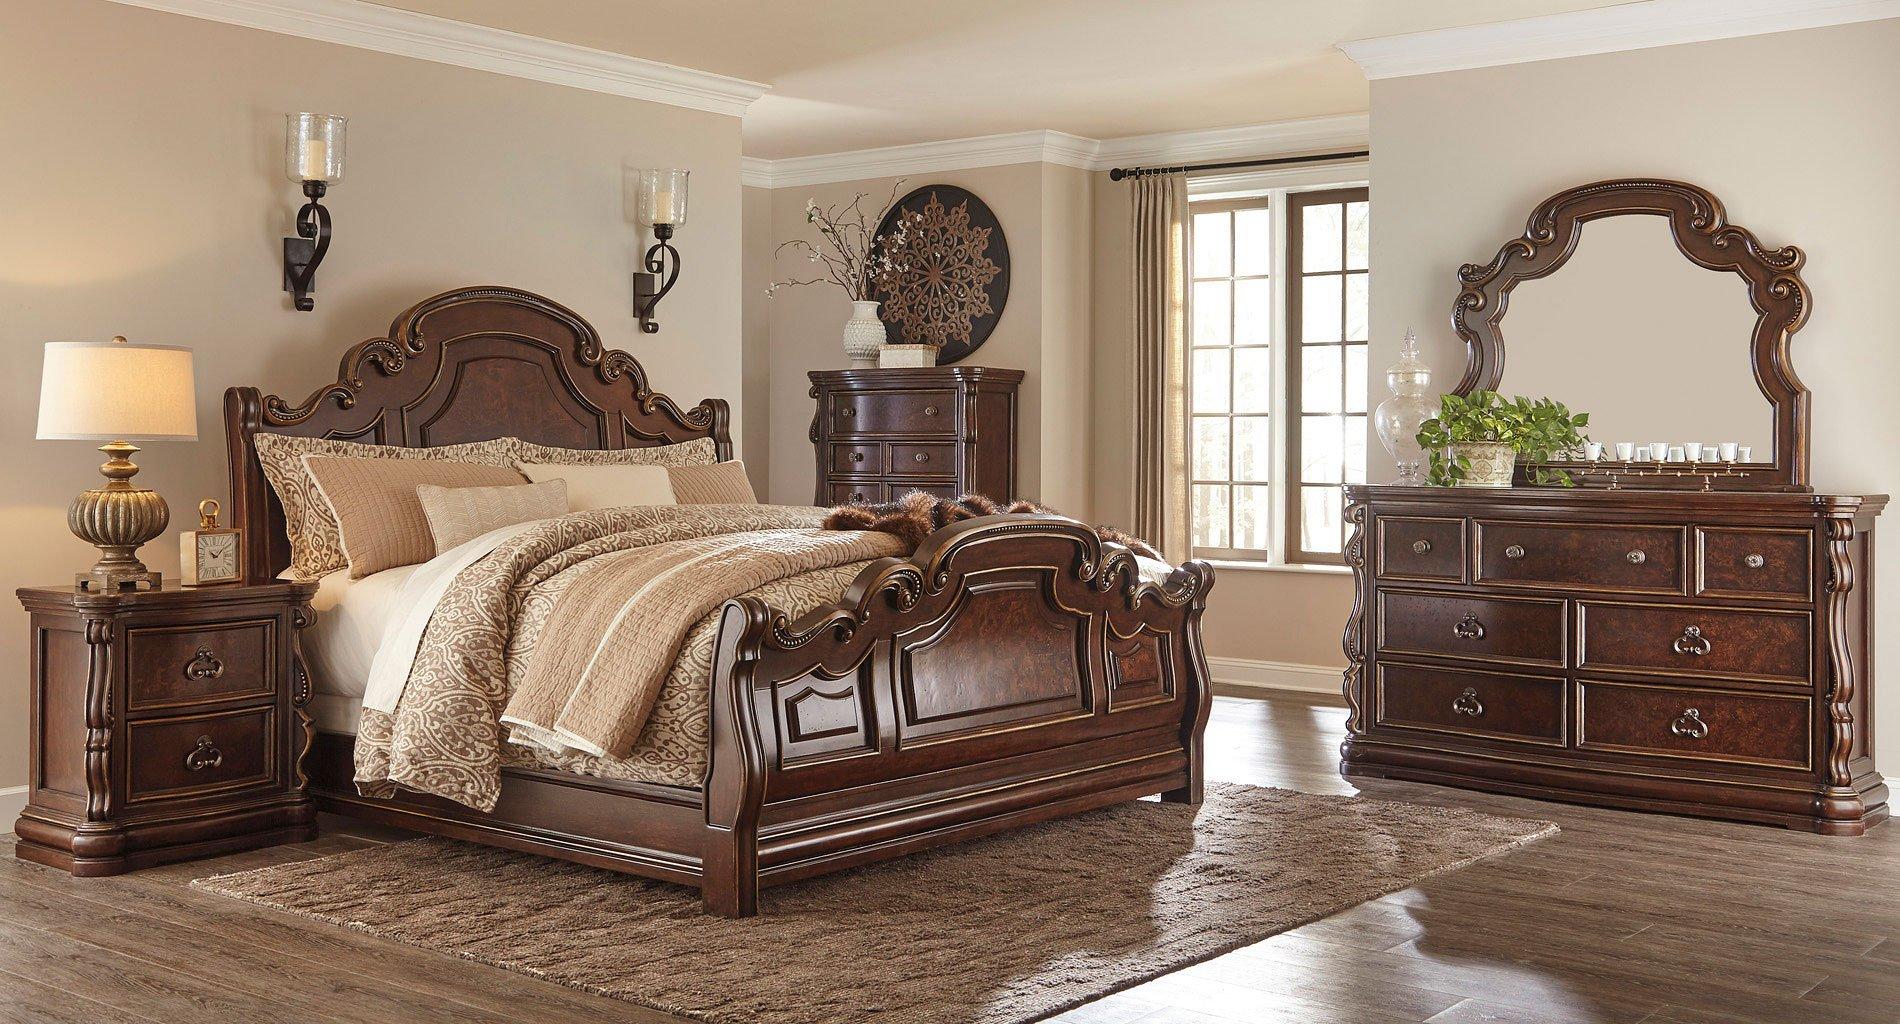 Superieur Florentown Sleigh Bedroom Set